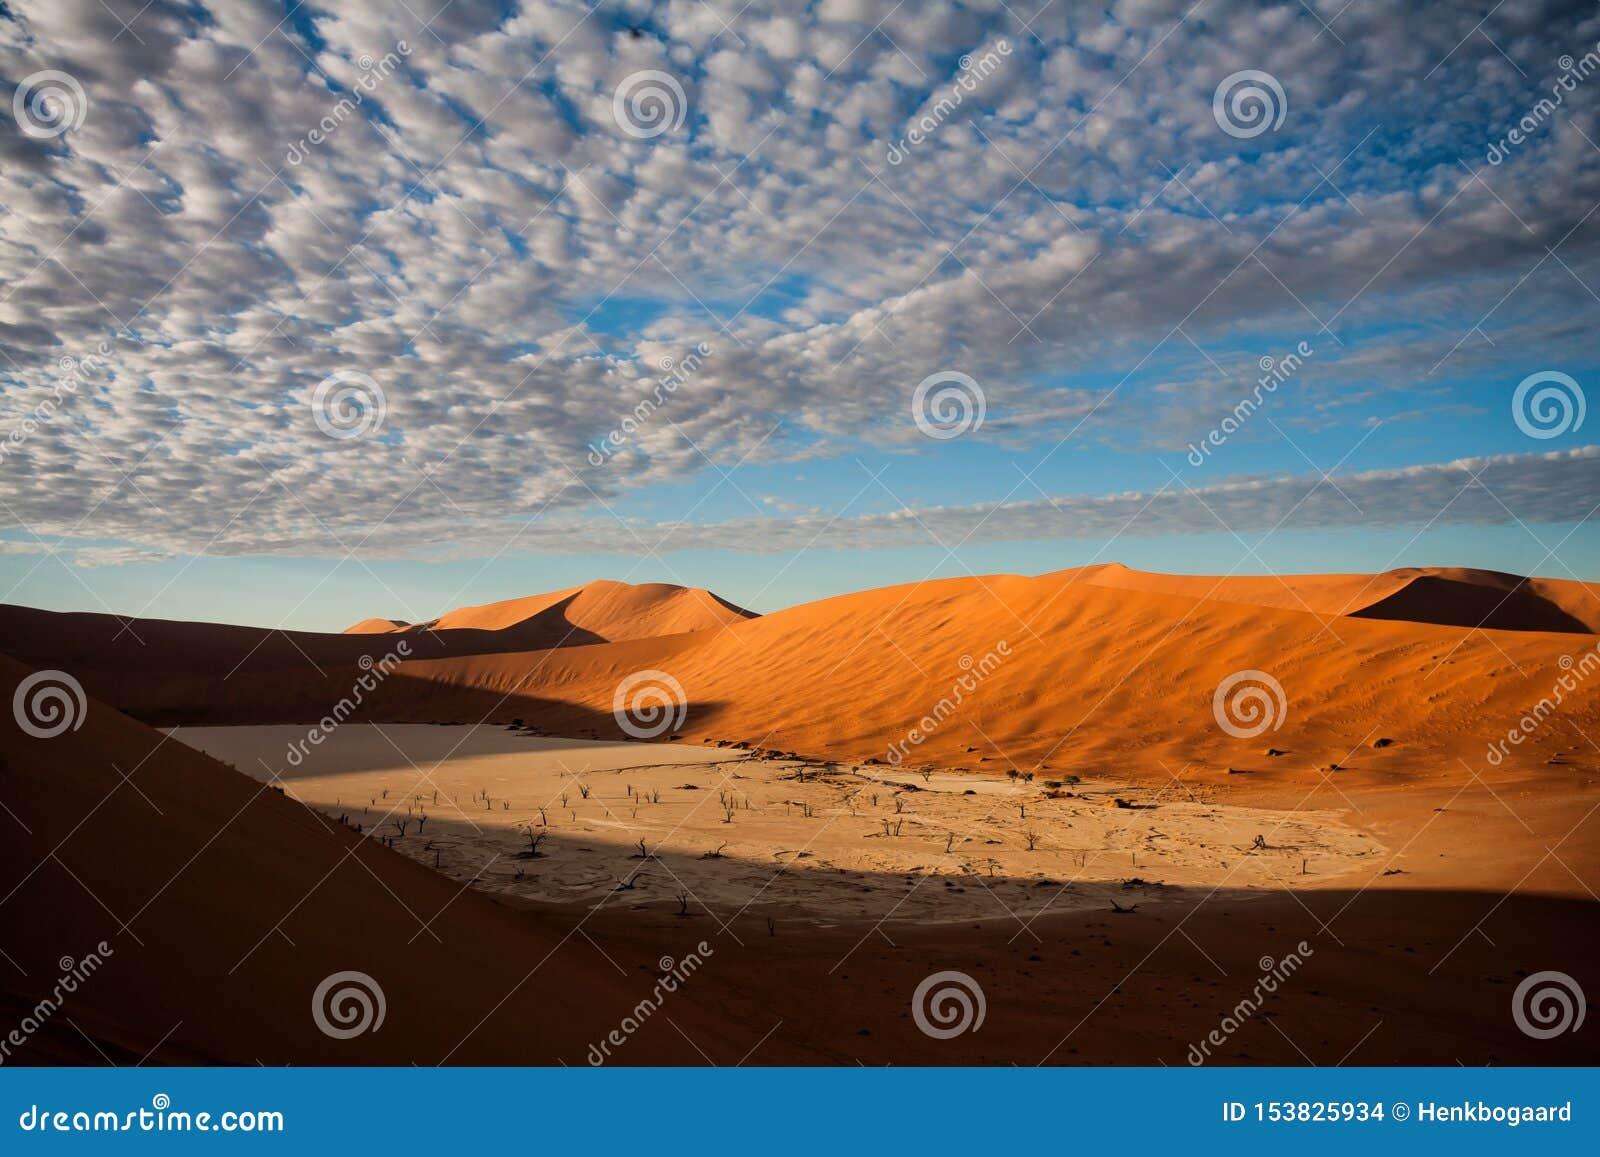 Dode Vlei dichtbij Sossusvlei in Nambia